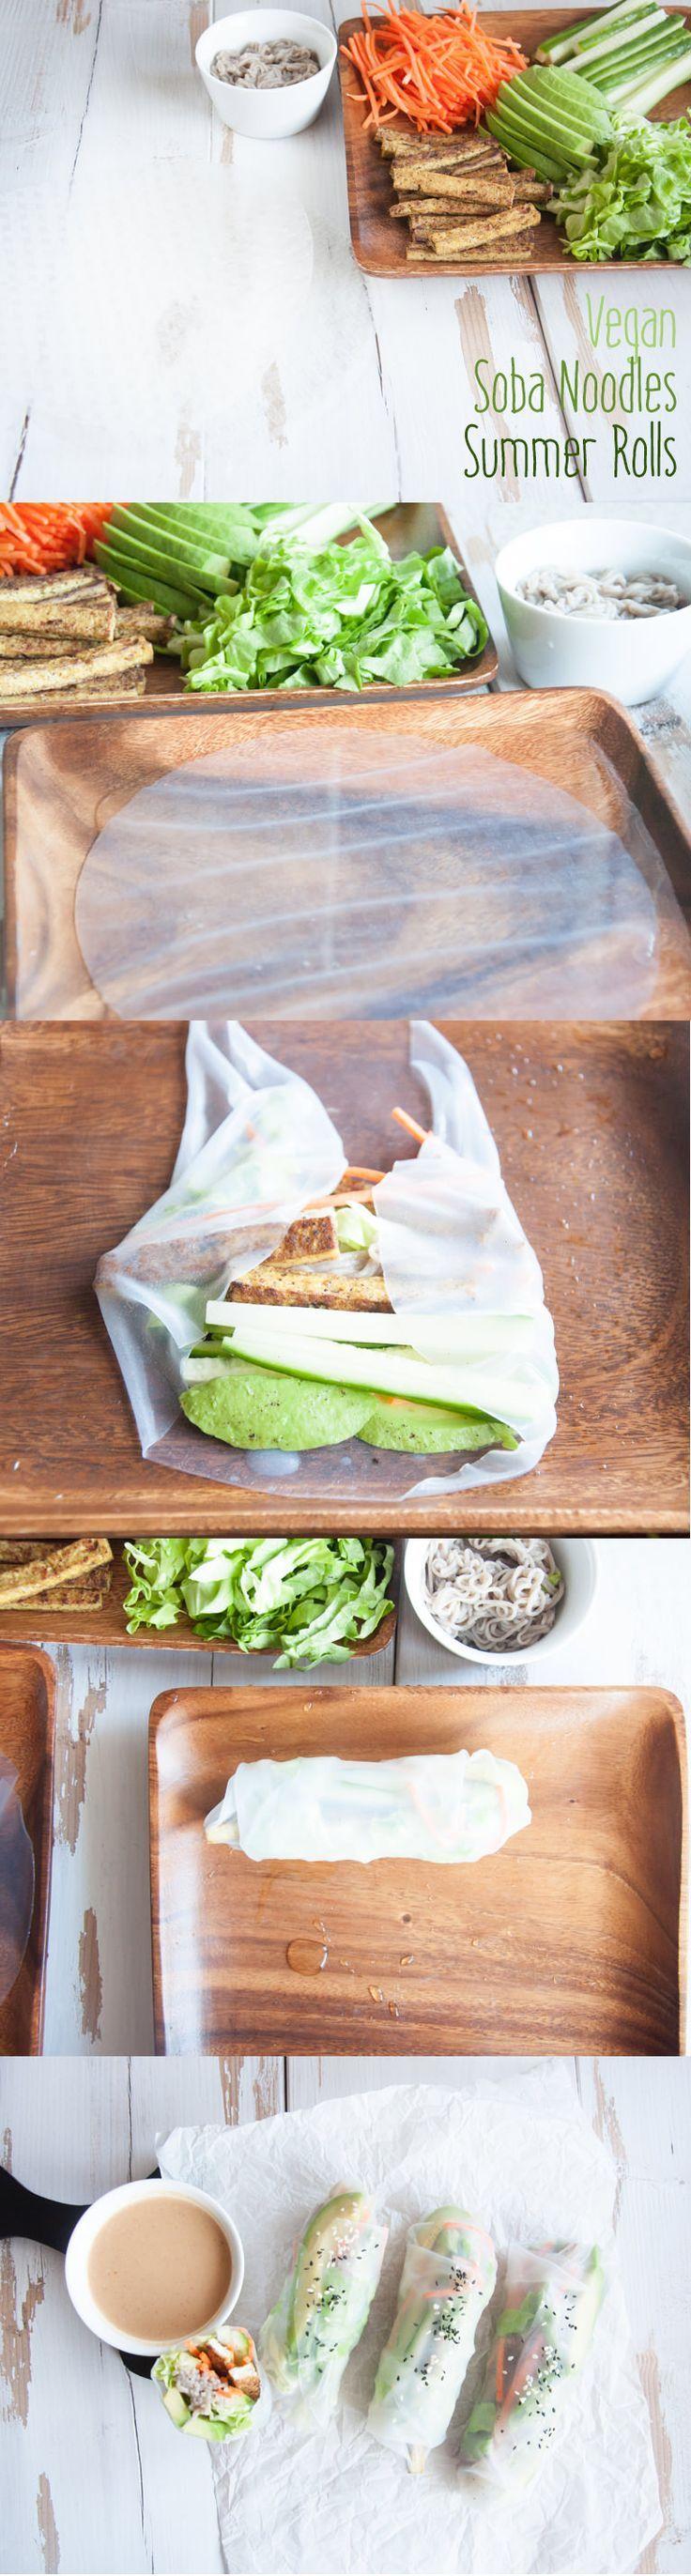 #Vegan & #glutenfree Soba Noodles Summer Rolls, filled with crispy tofu, avocado, veggies and soba noodles! From ElephantasticVegan.com